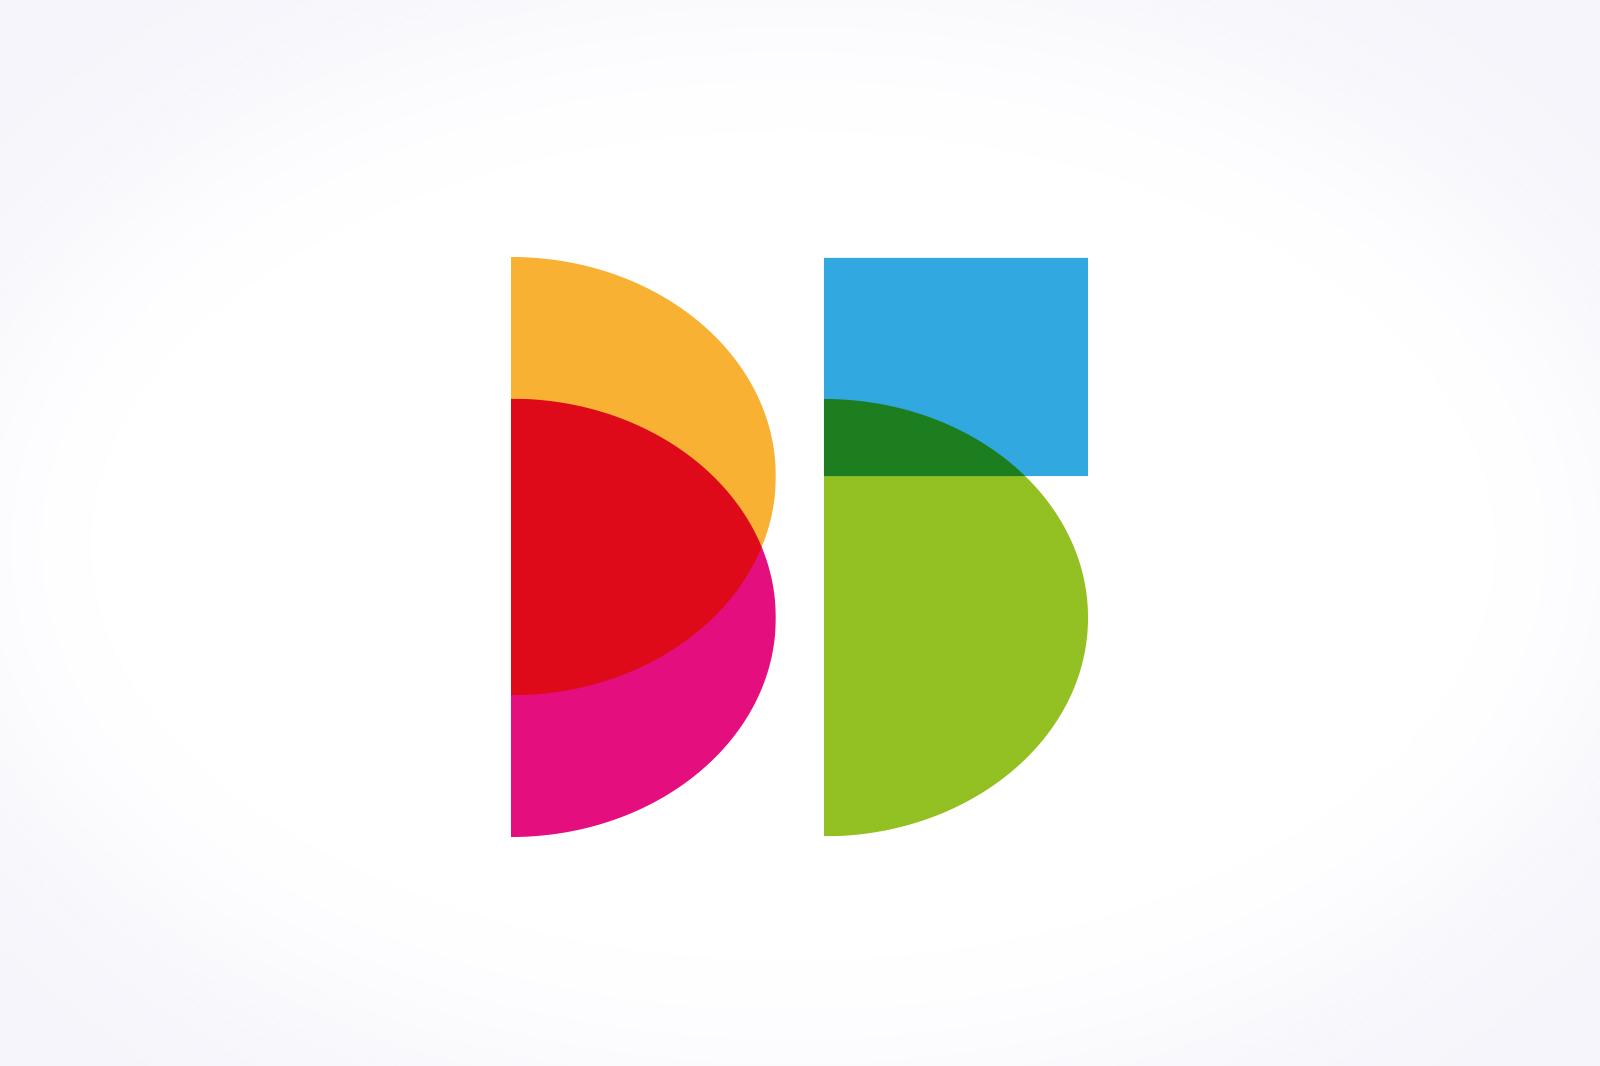 Pedro Cabañas - Design - REBRANDING 35 YEARS